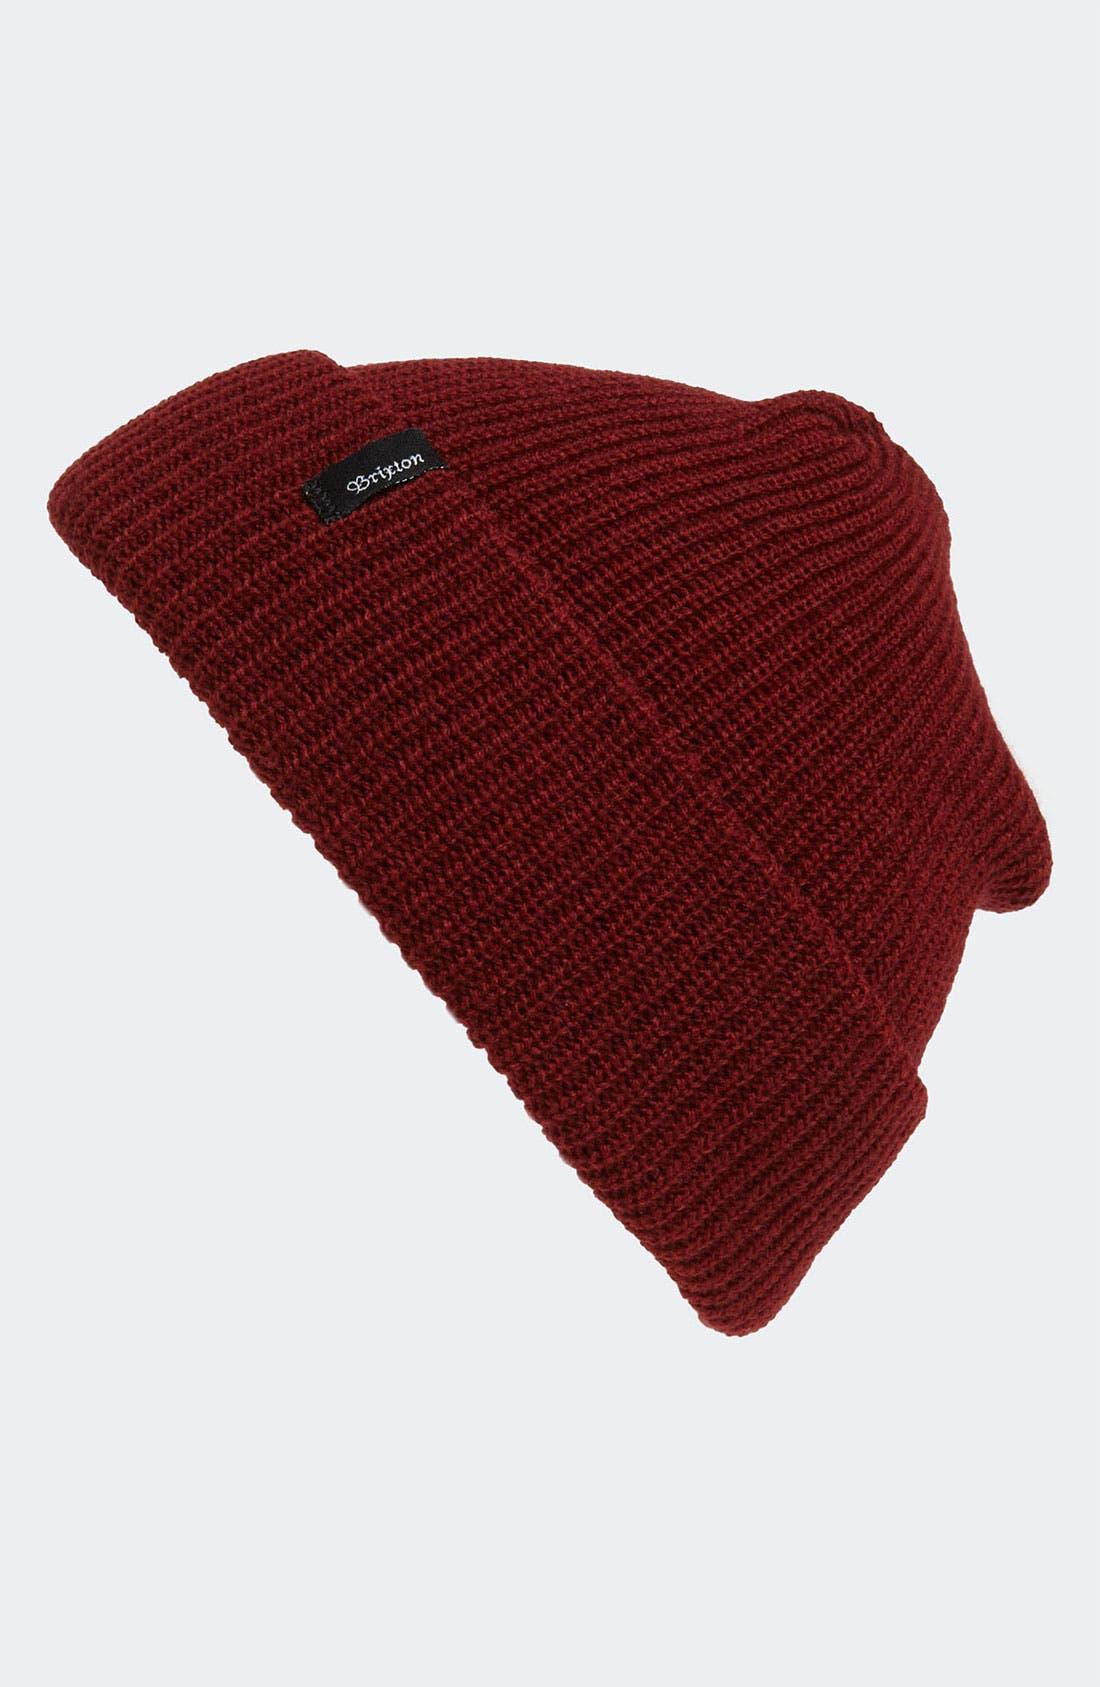 Main Image - Brixton 'Heist' Rib Knit Cap (Men)